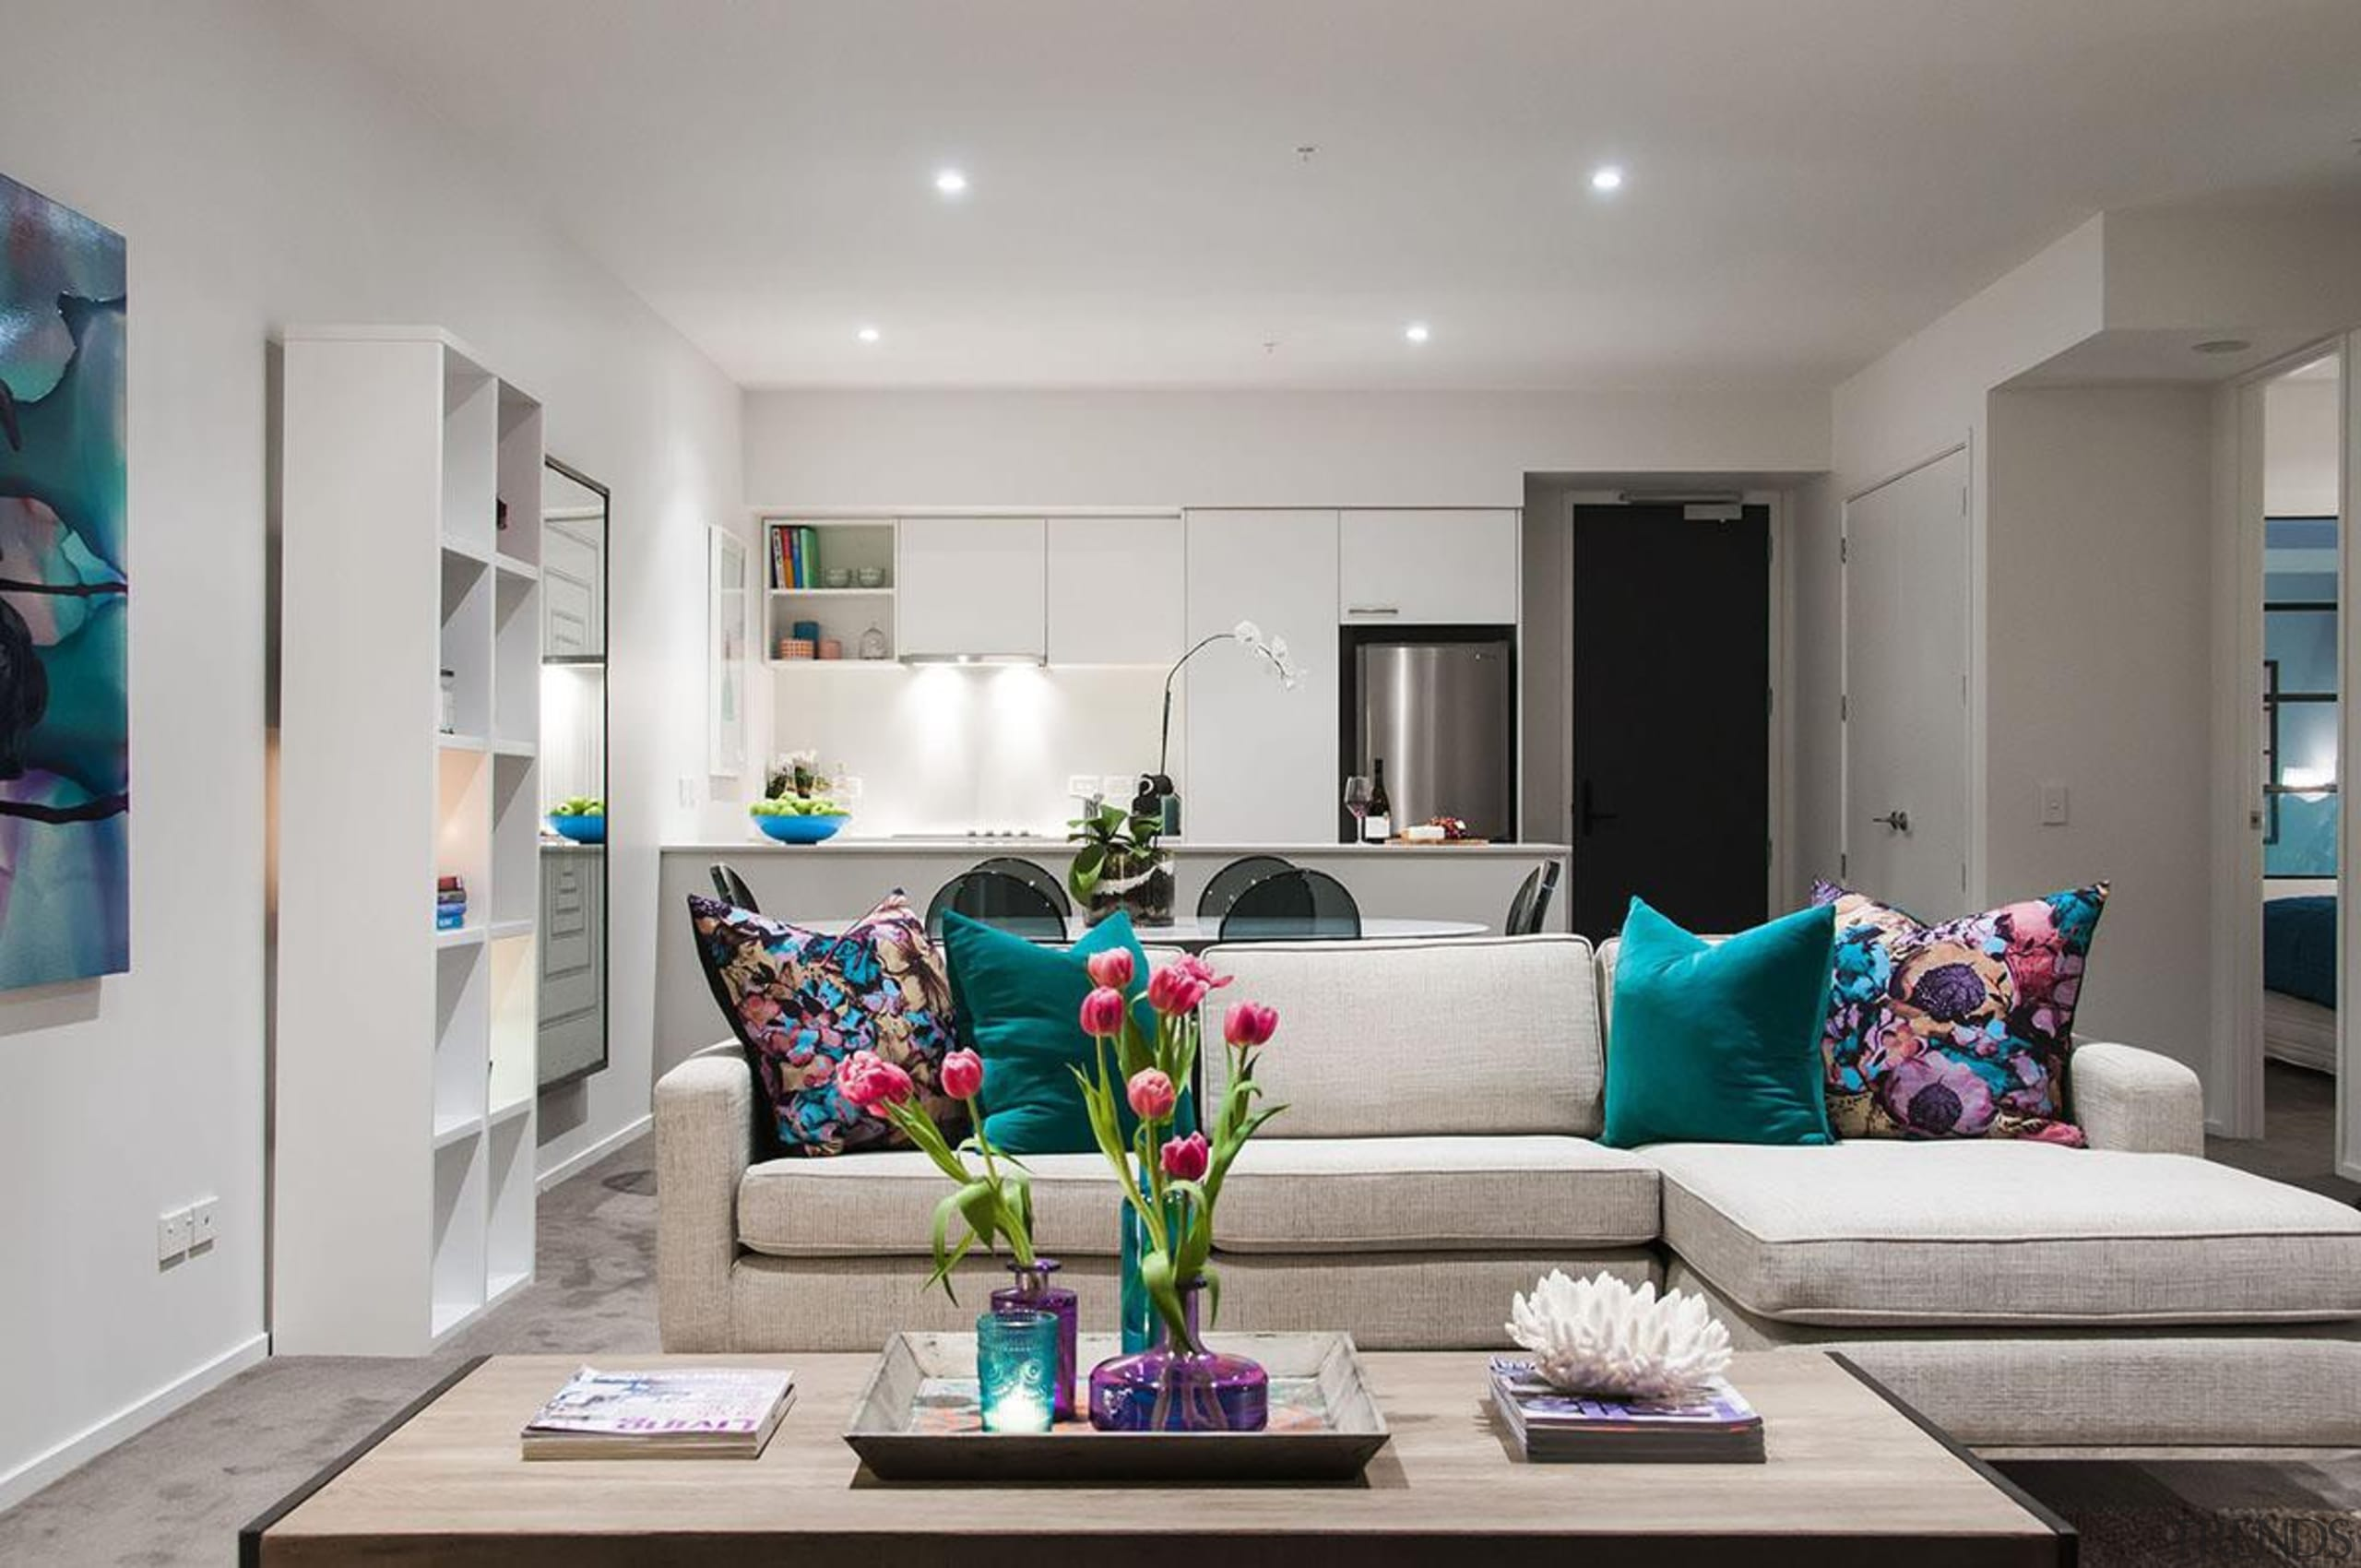 132 vincent street1.jpg - 132_vincent_street1.jpg - home   home, interior design, living room, real estate, room, gray